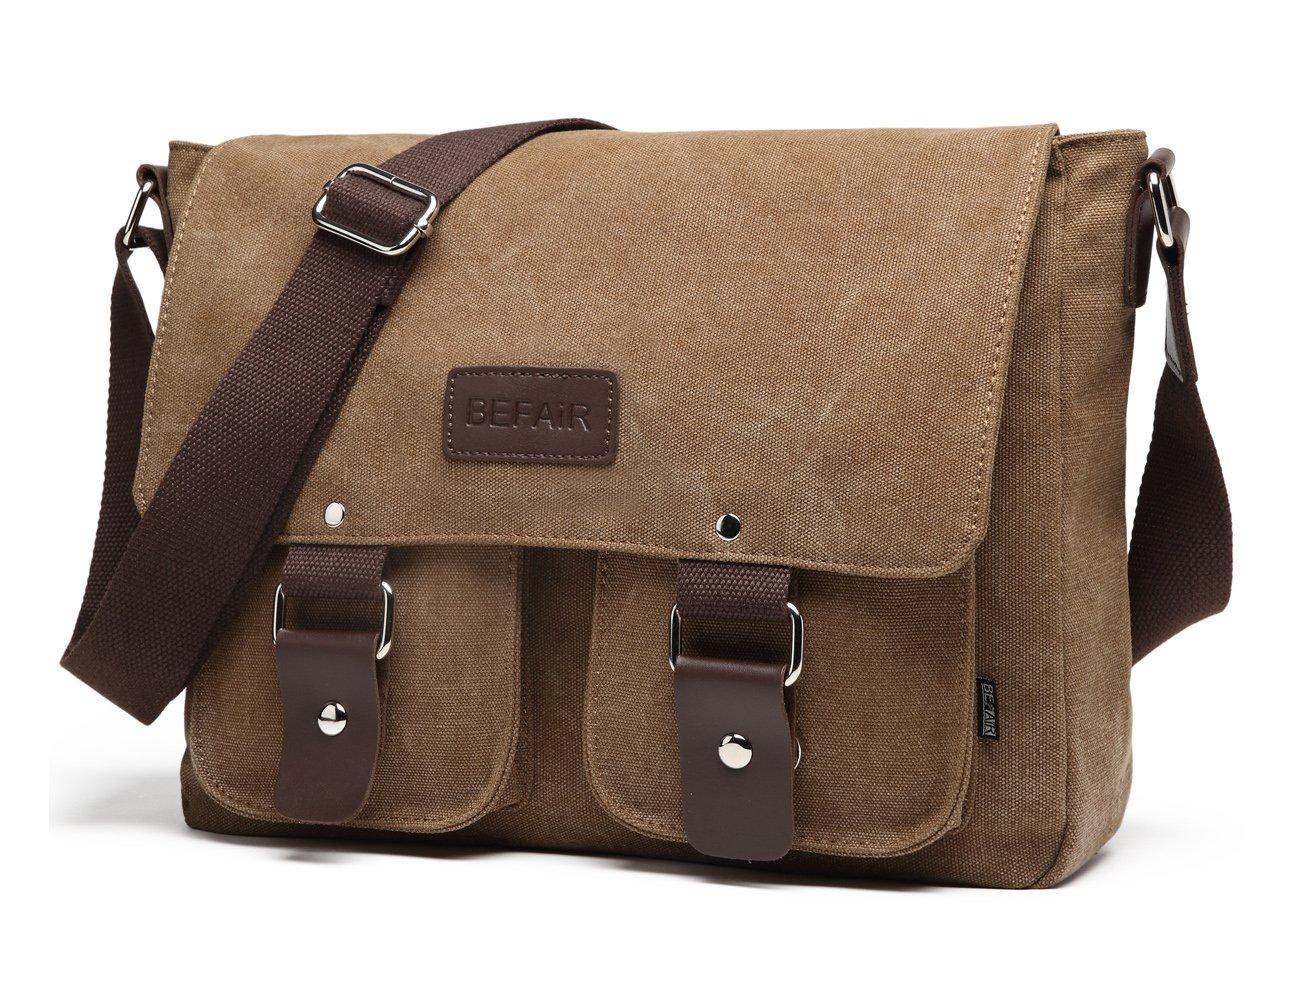 7c97871fa4 Amazon.com  BEFAiR Canvas Messenger Bag Vintage Shoulder Bag Laptop Bag  School Bag Bookbag Travel Bag for Men and Women Coffee  Sports   Outdoors